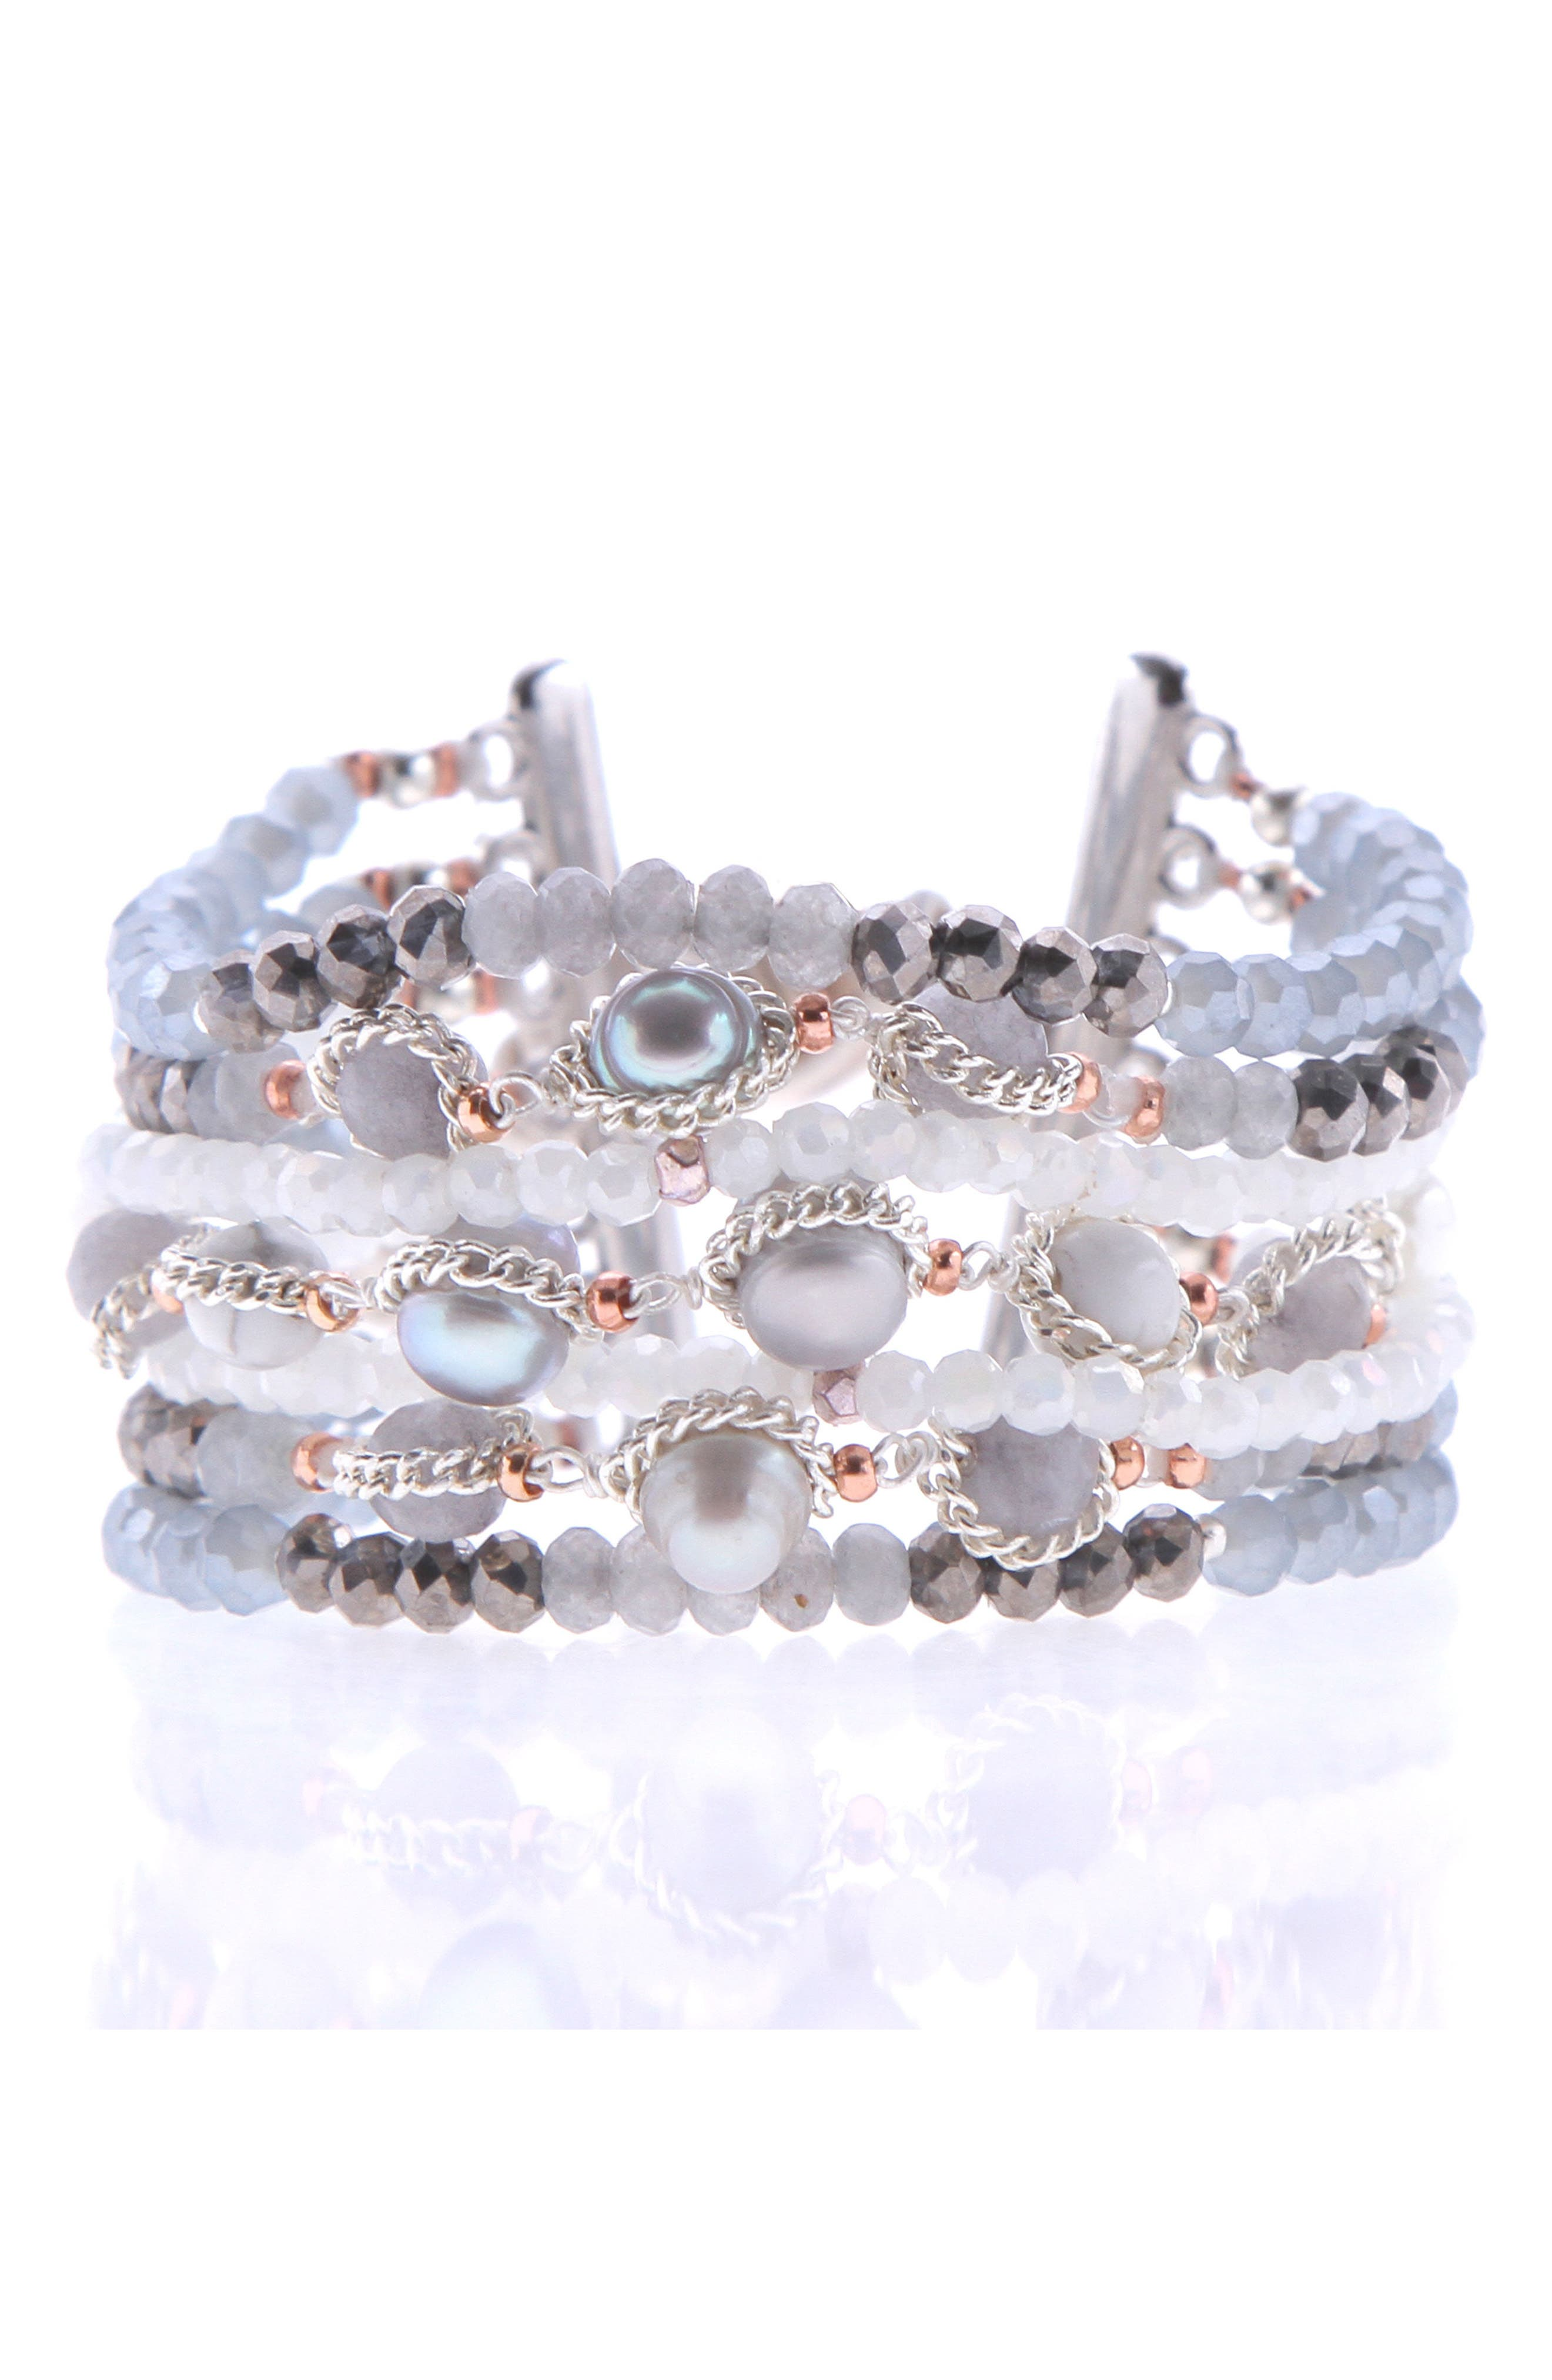 Crystal & Imitation Pearl Bracelet,                             Main thumbnail 1, color,                             Silver